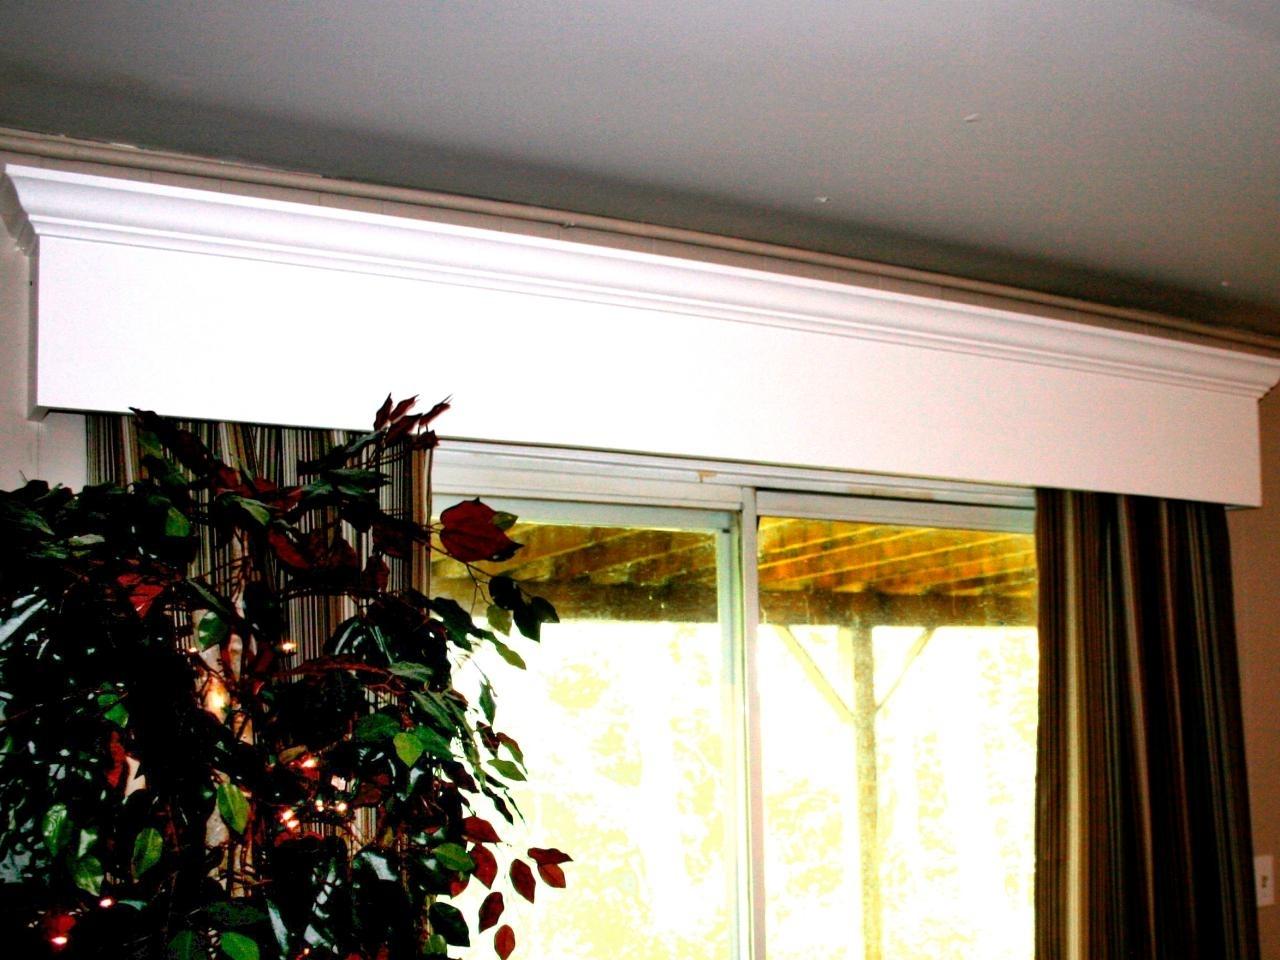 Wood Valances For Sliding Glass Doorswood valance for sliding glass doors sliding doors ideas